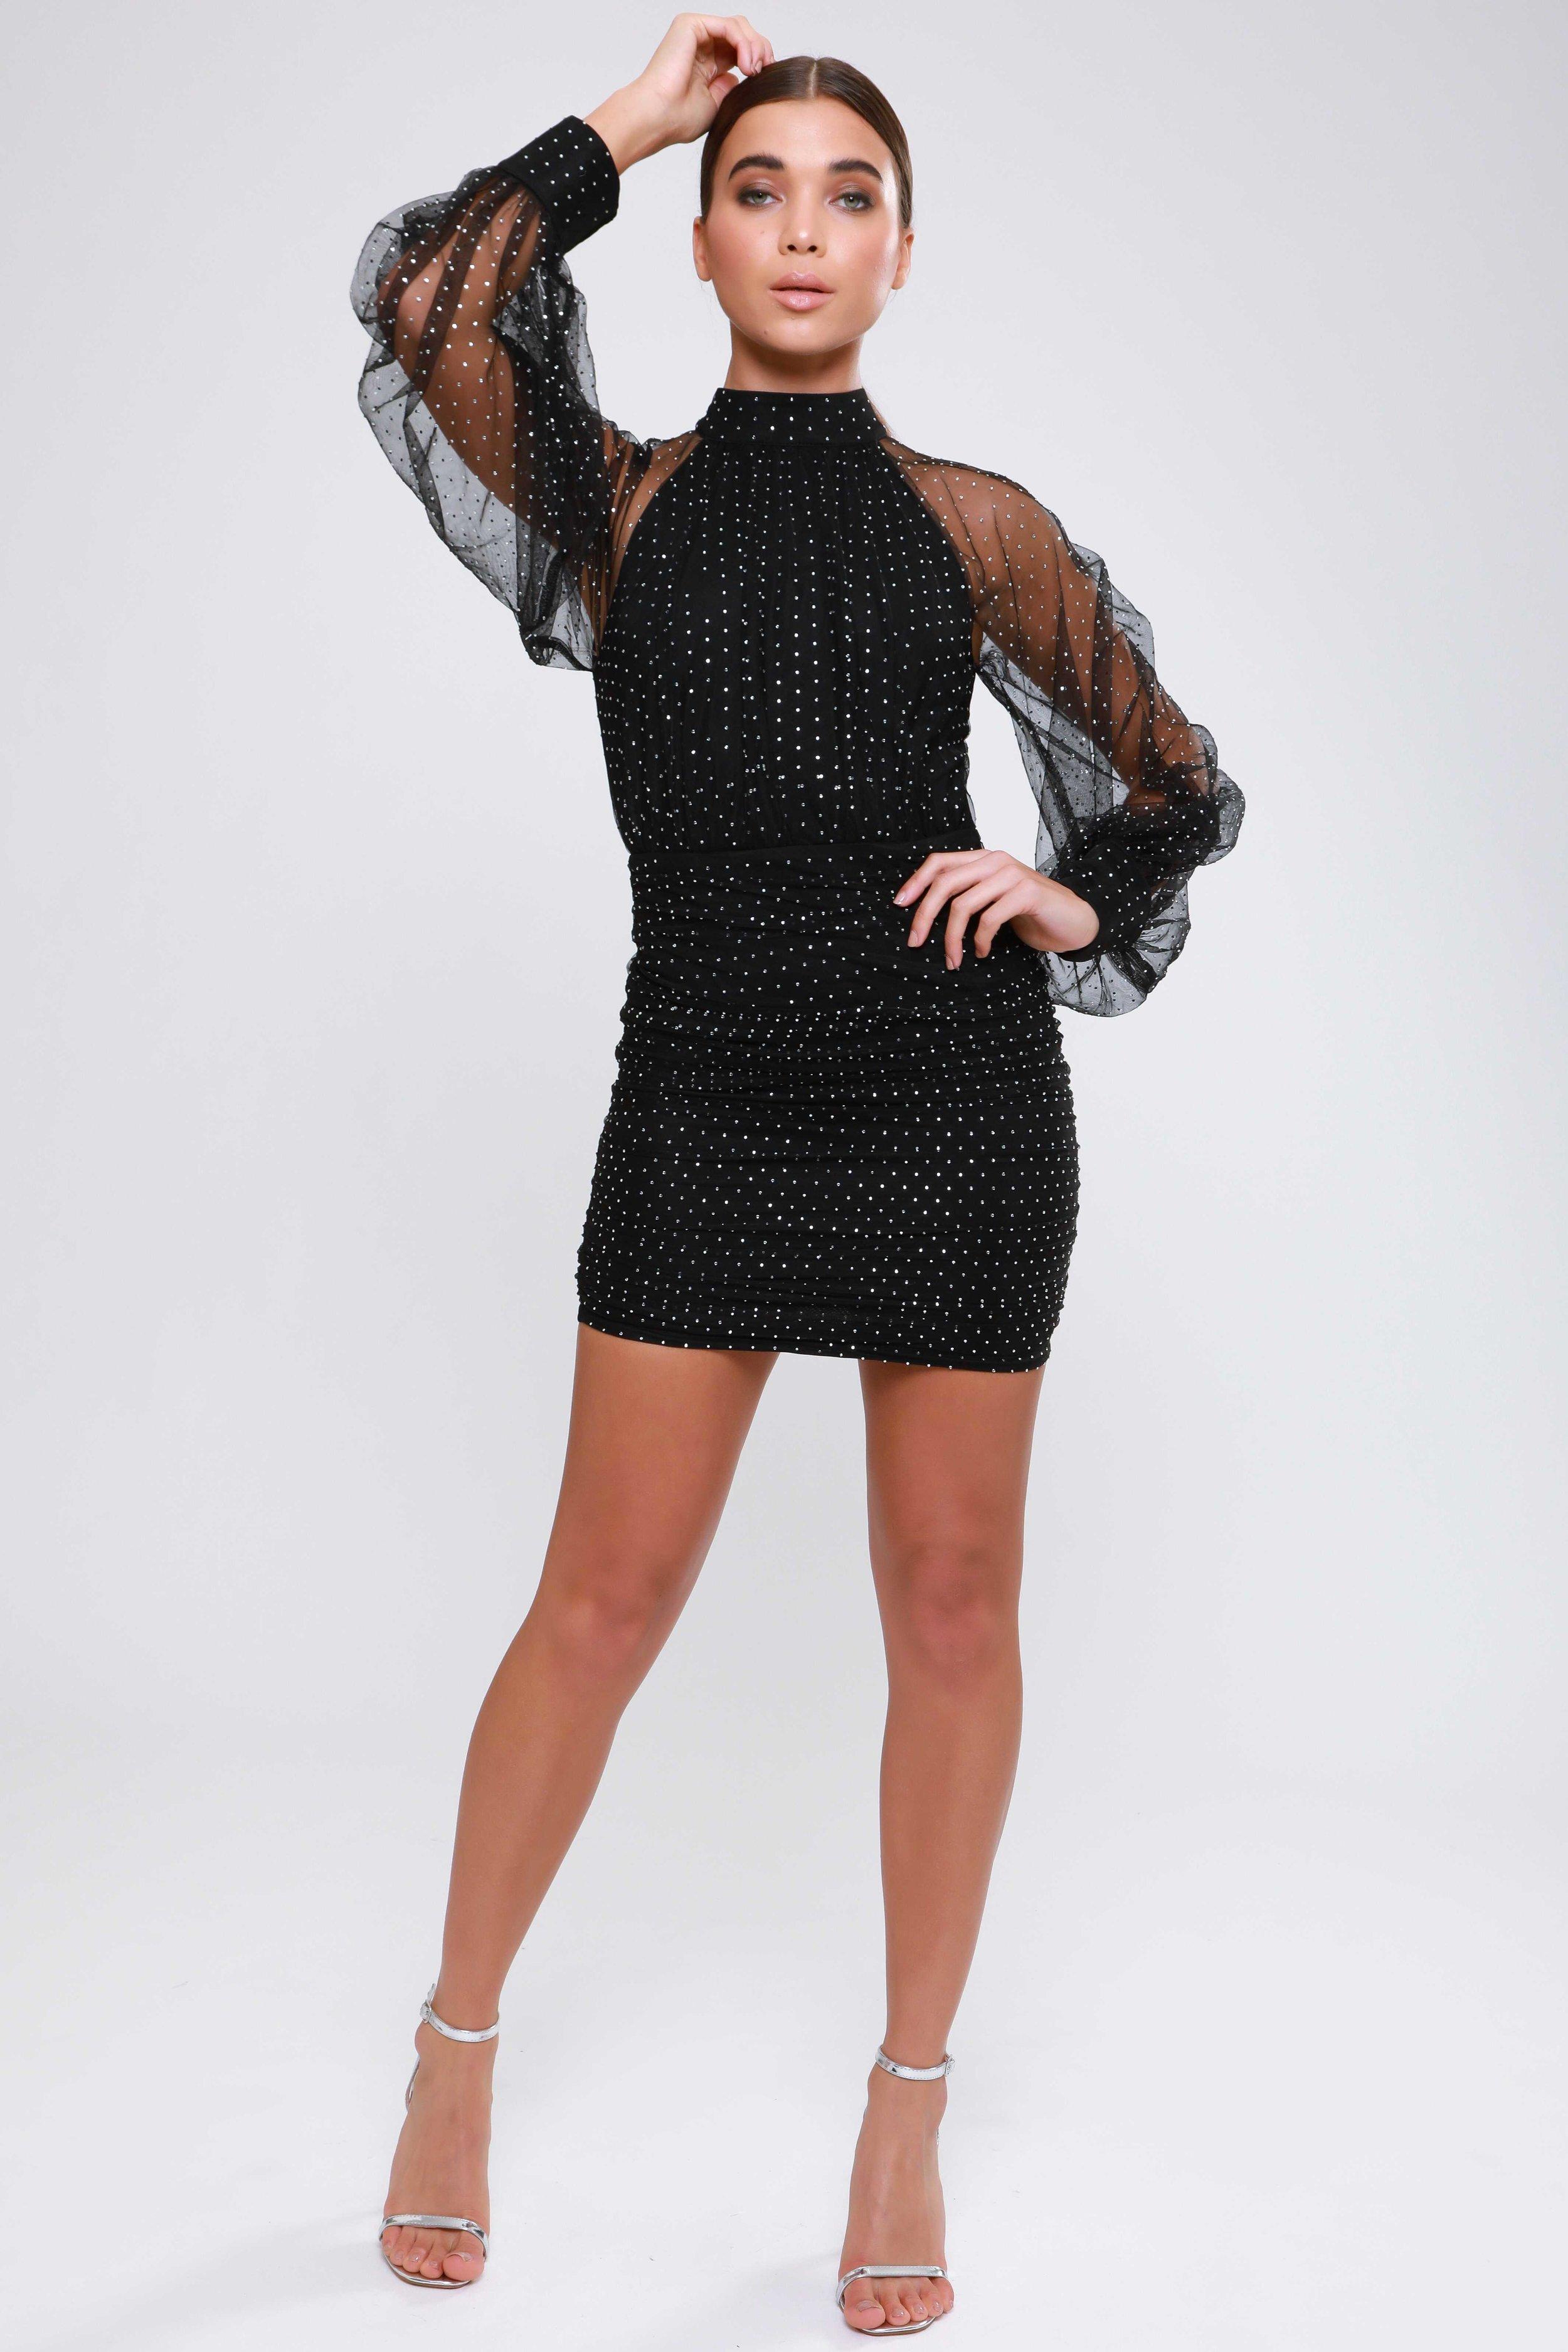 Diamante Mesh  Raglan Sleeve Dress   £65.00